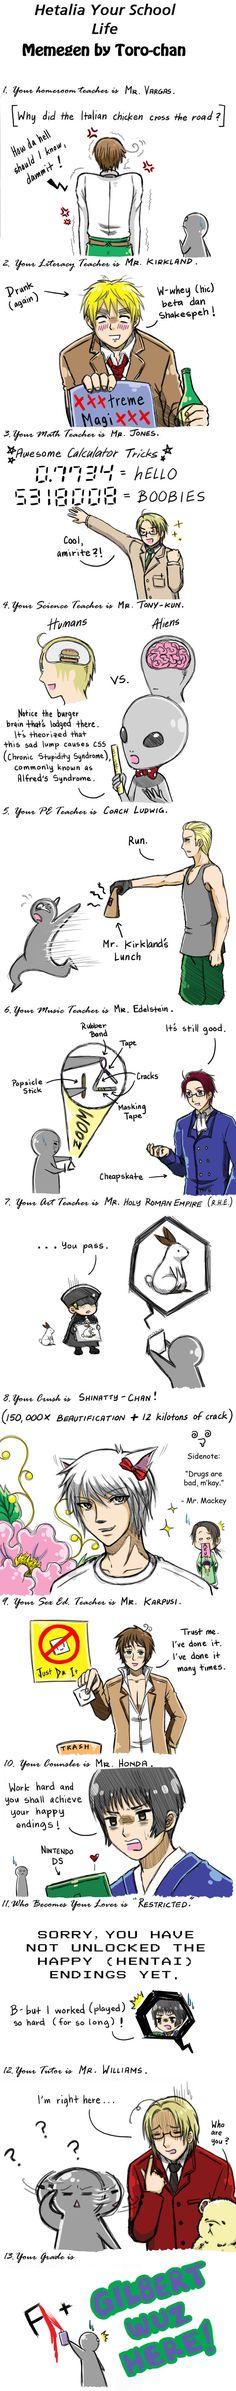 Hetalia: Hetalia School Meme by ~khakipants12 I can't help it, its just so funny!